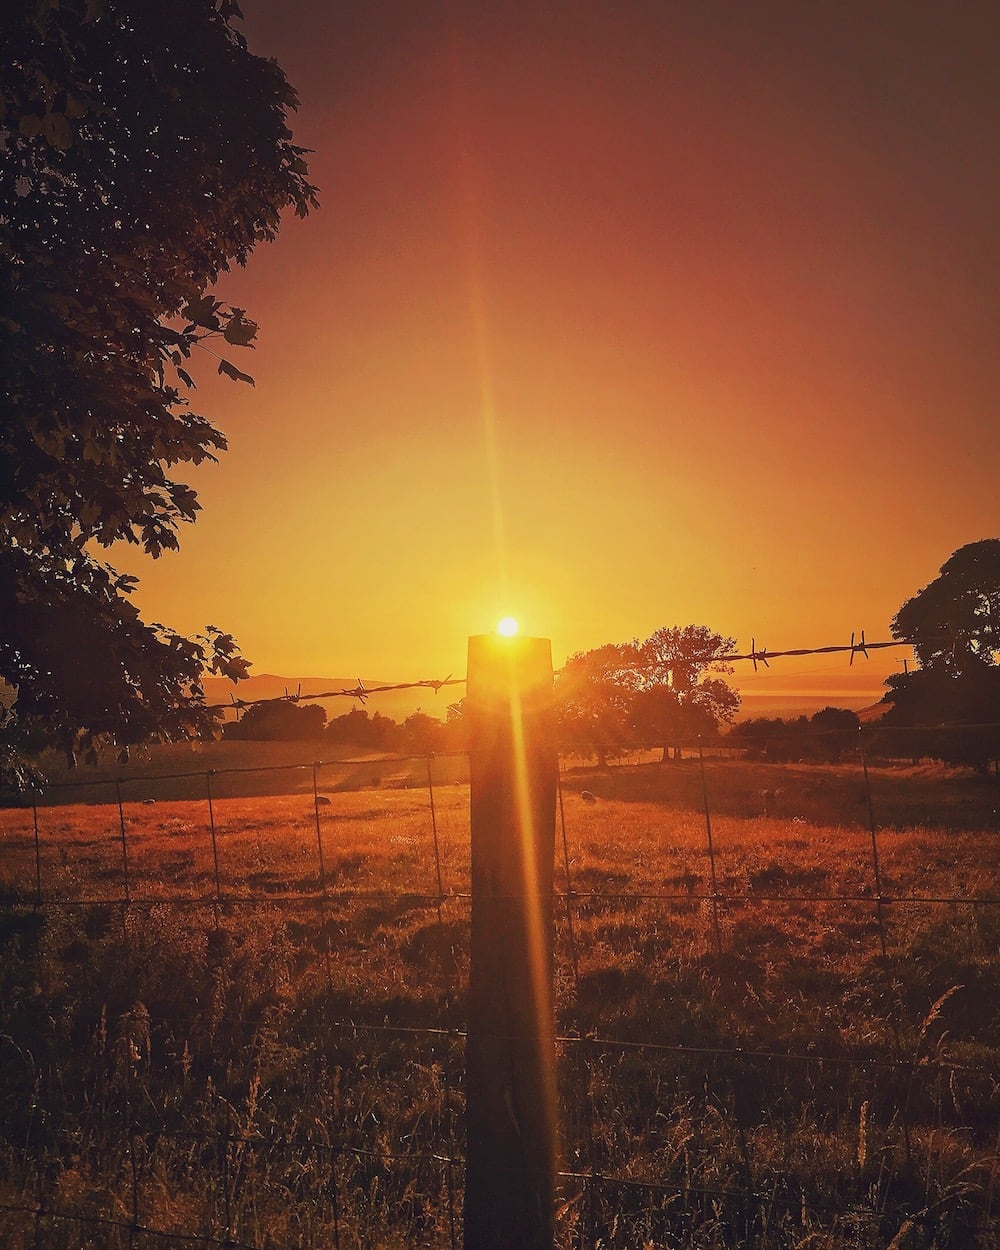 Glan Clwyd Isa | Denbighshire Sunsets 3 | thefrozendivide